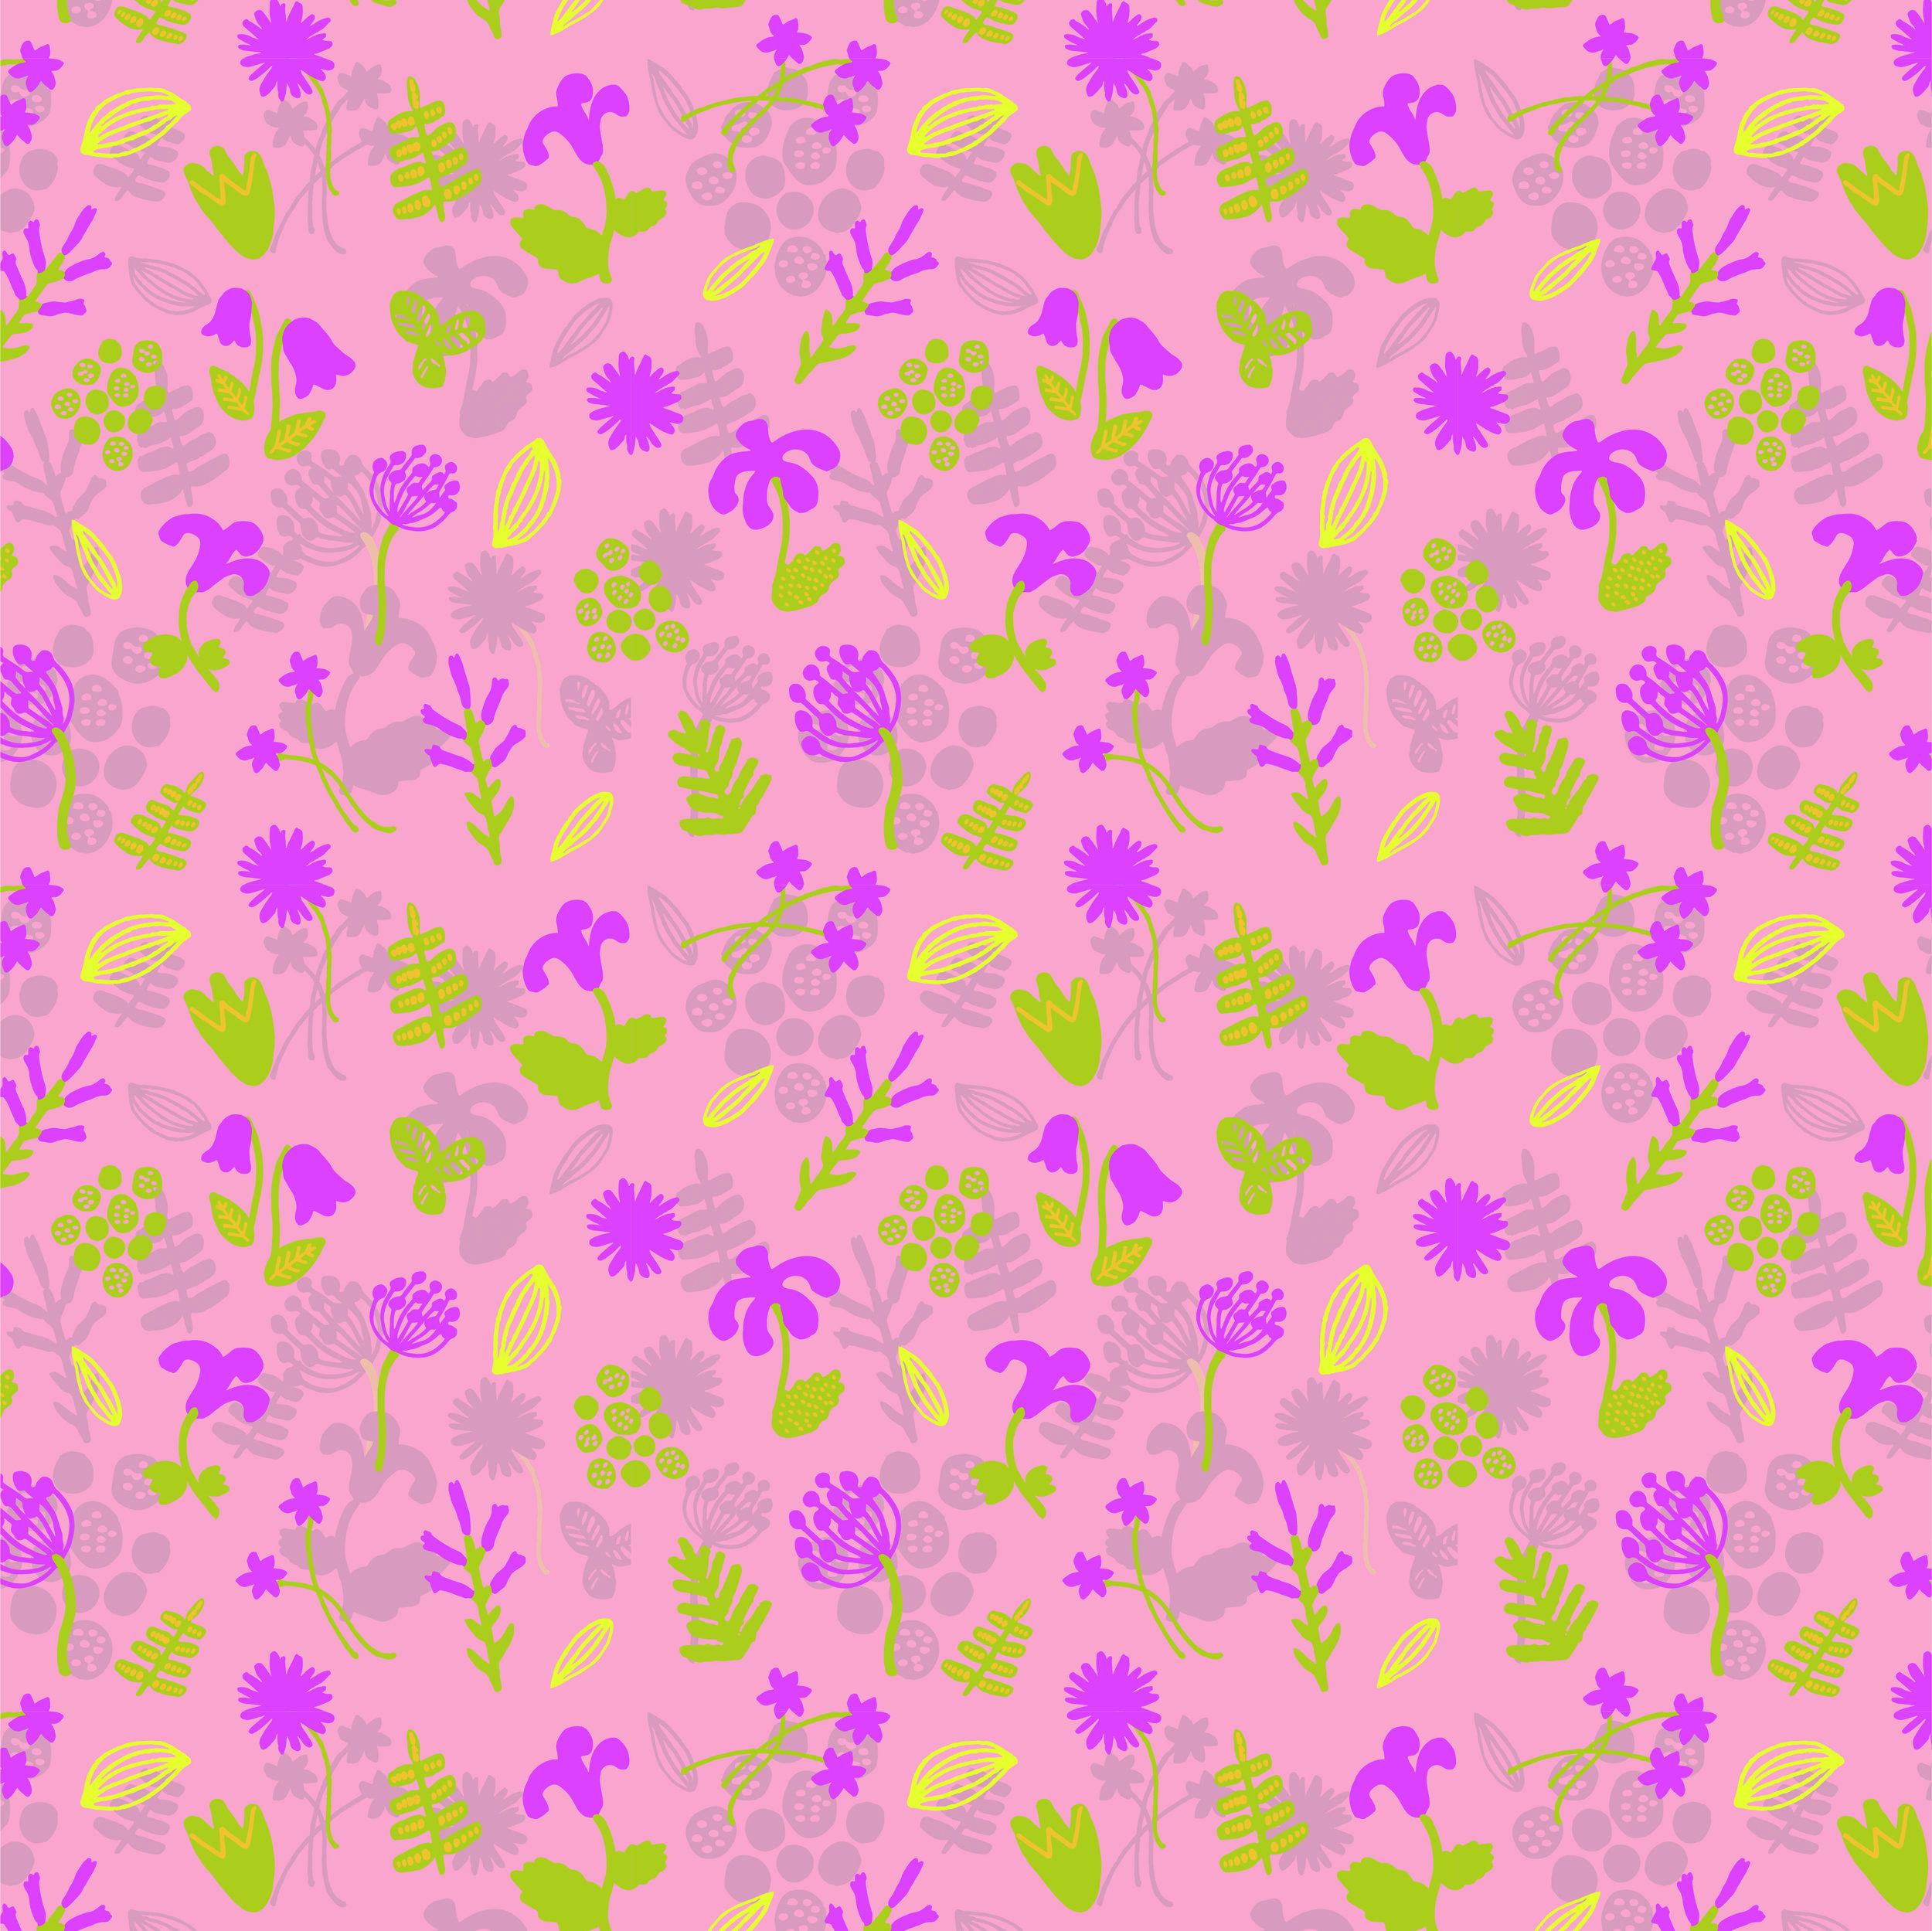 Blommönster-22.jpg